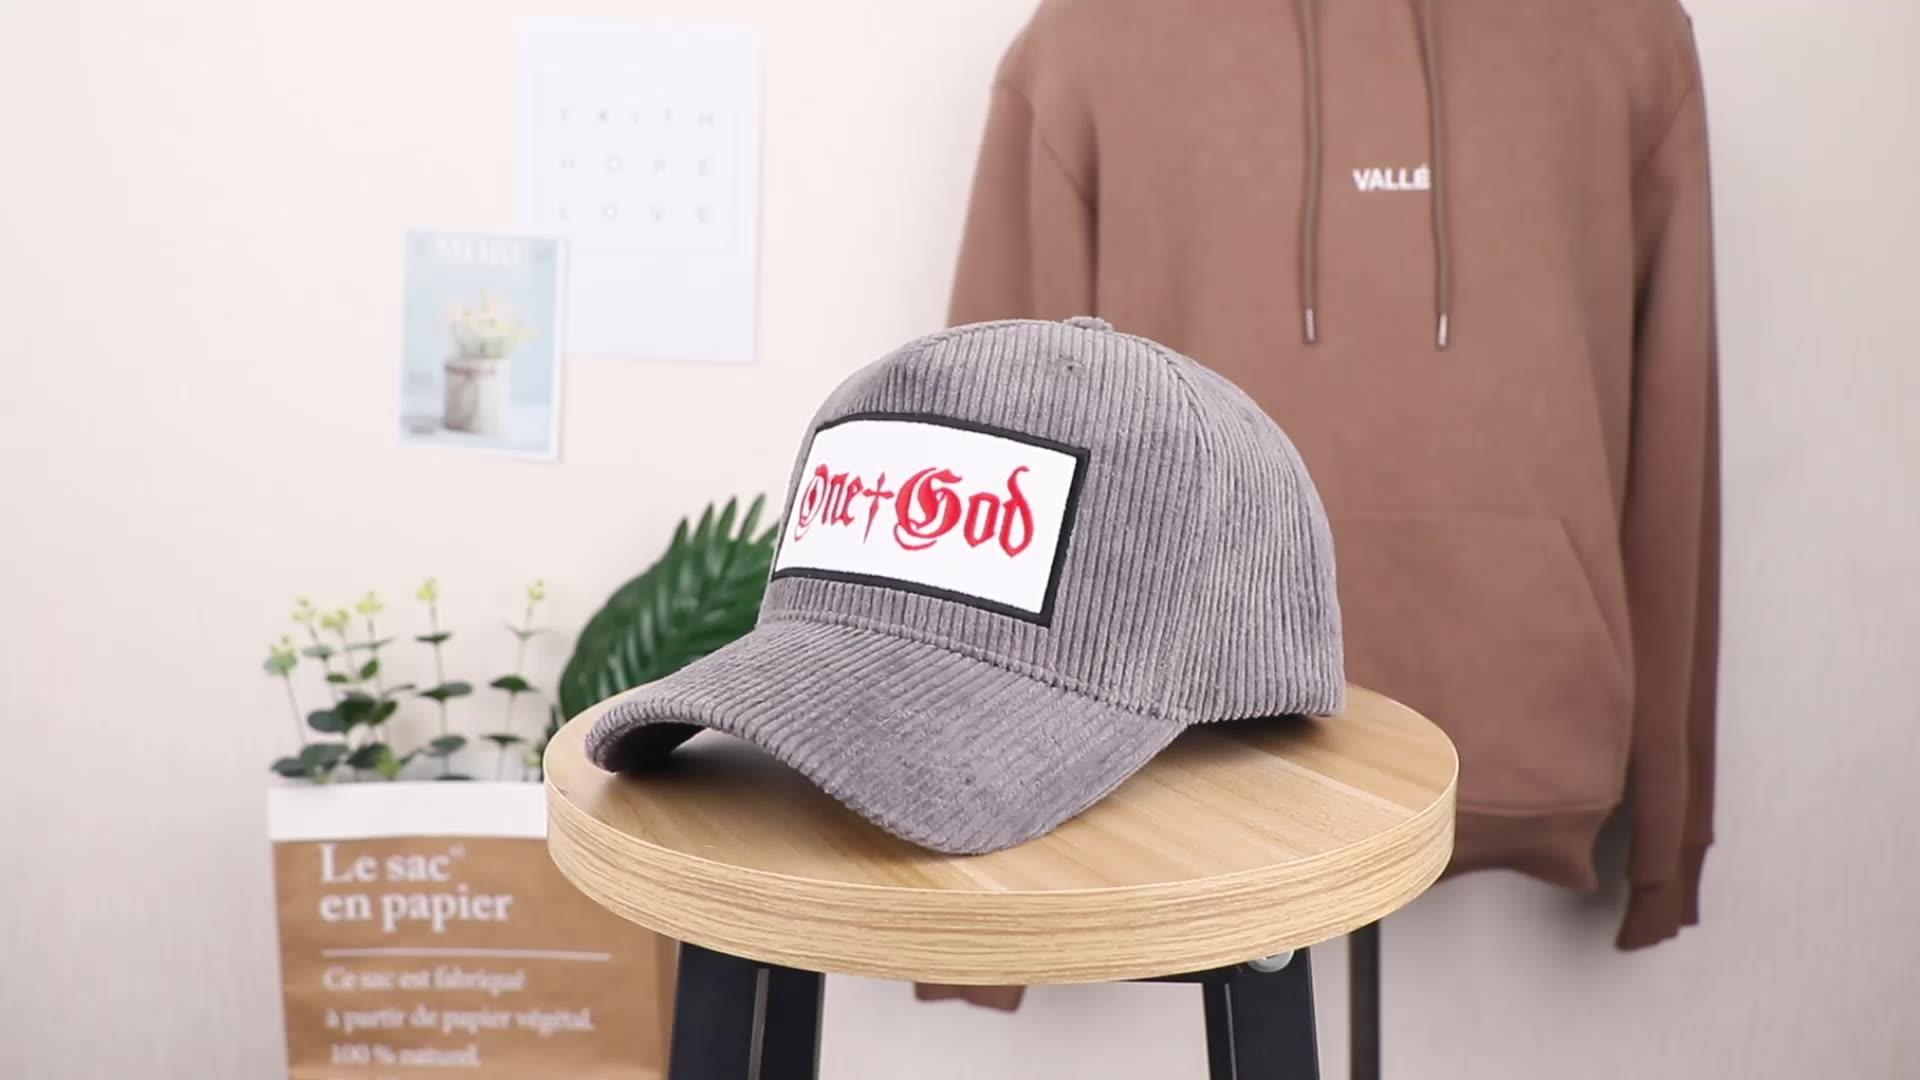 फैशन कस्टम लोगो कॉरडरॉय टोपी 3D कढ़ाई बेसबॉल टोपी